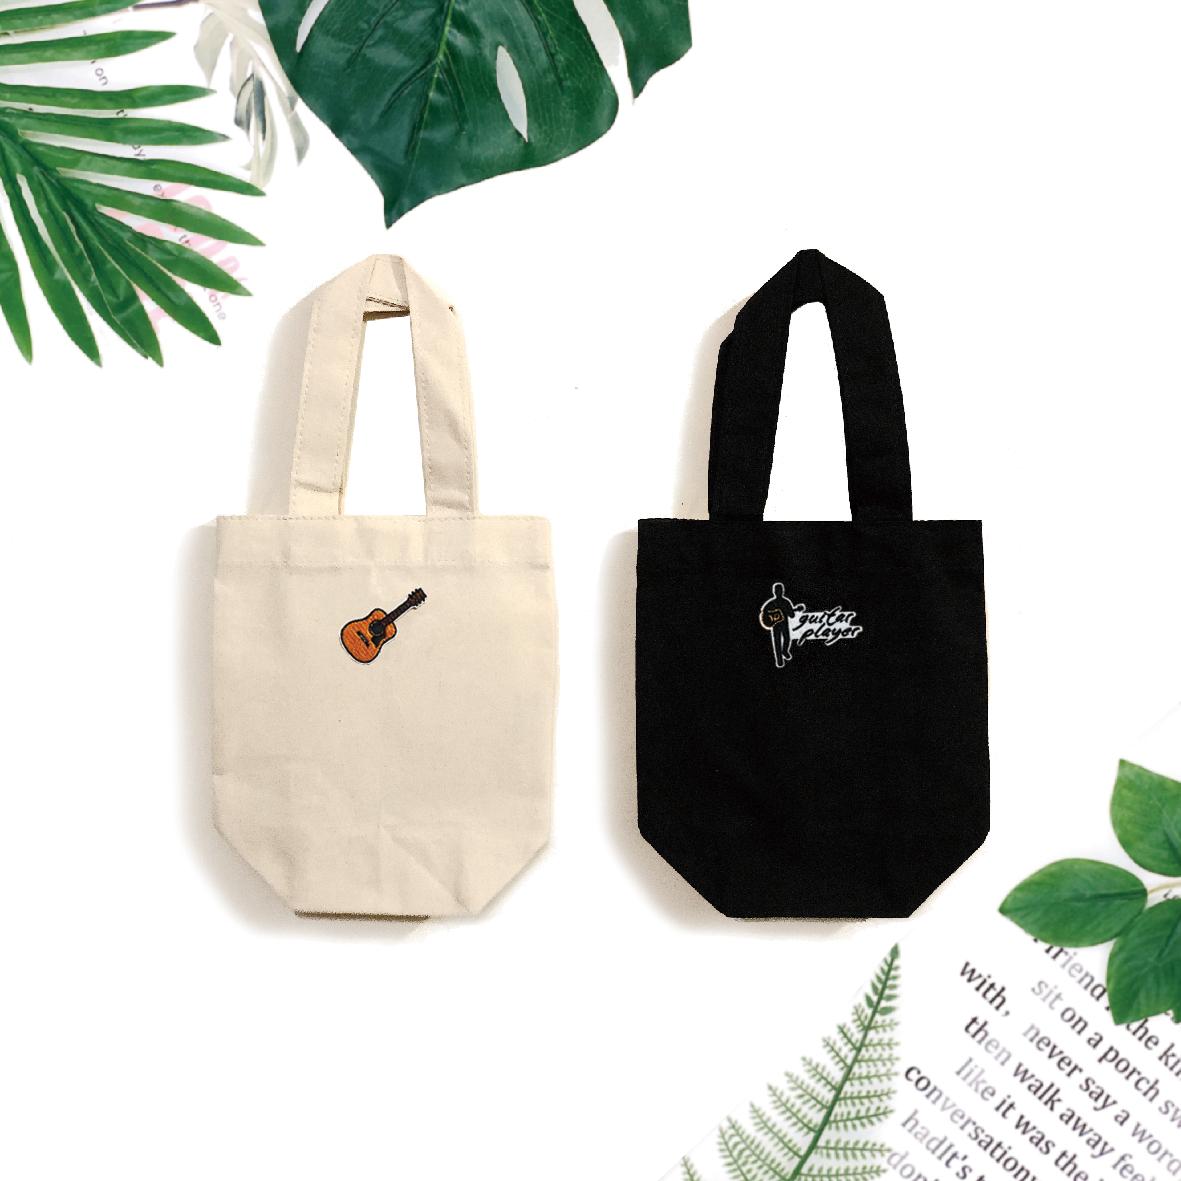 袋袋-011.png